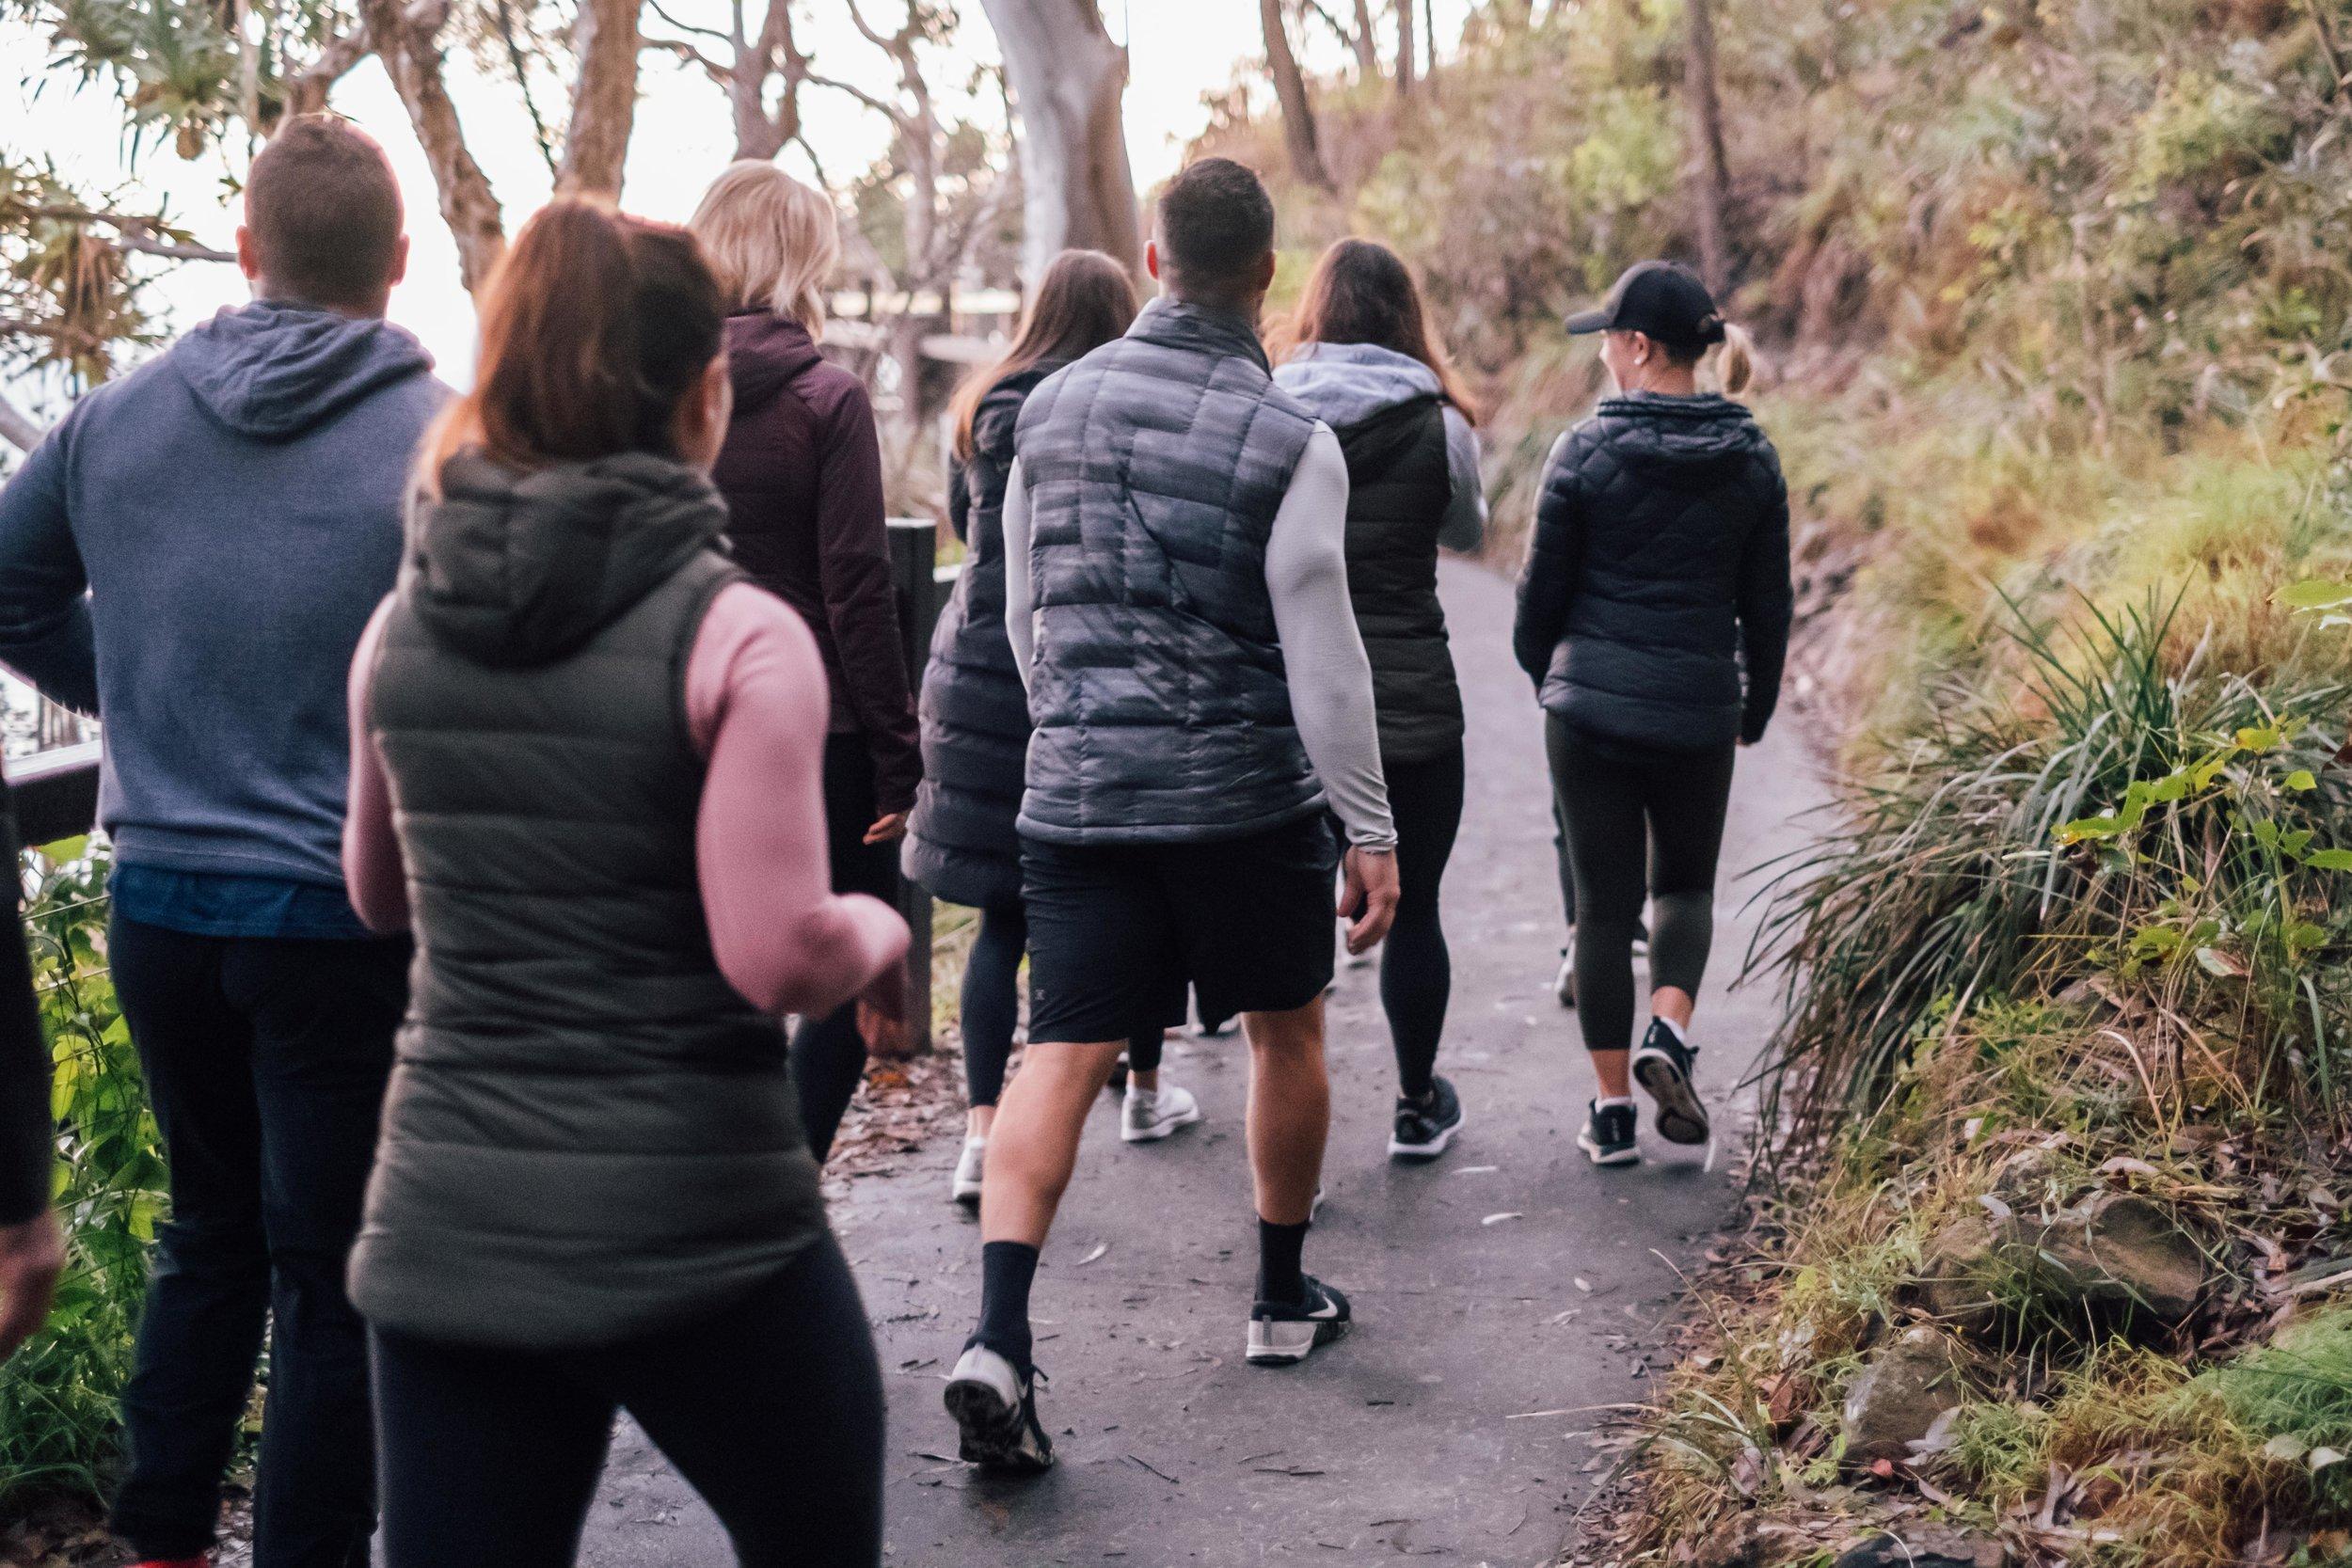 Lululemon_Outerwear Hike_2019-6.jpg